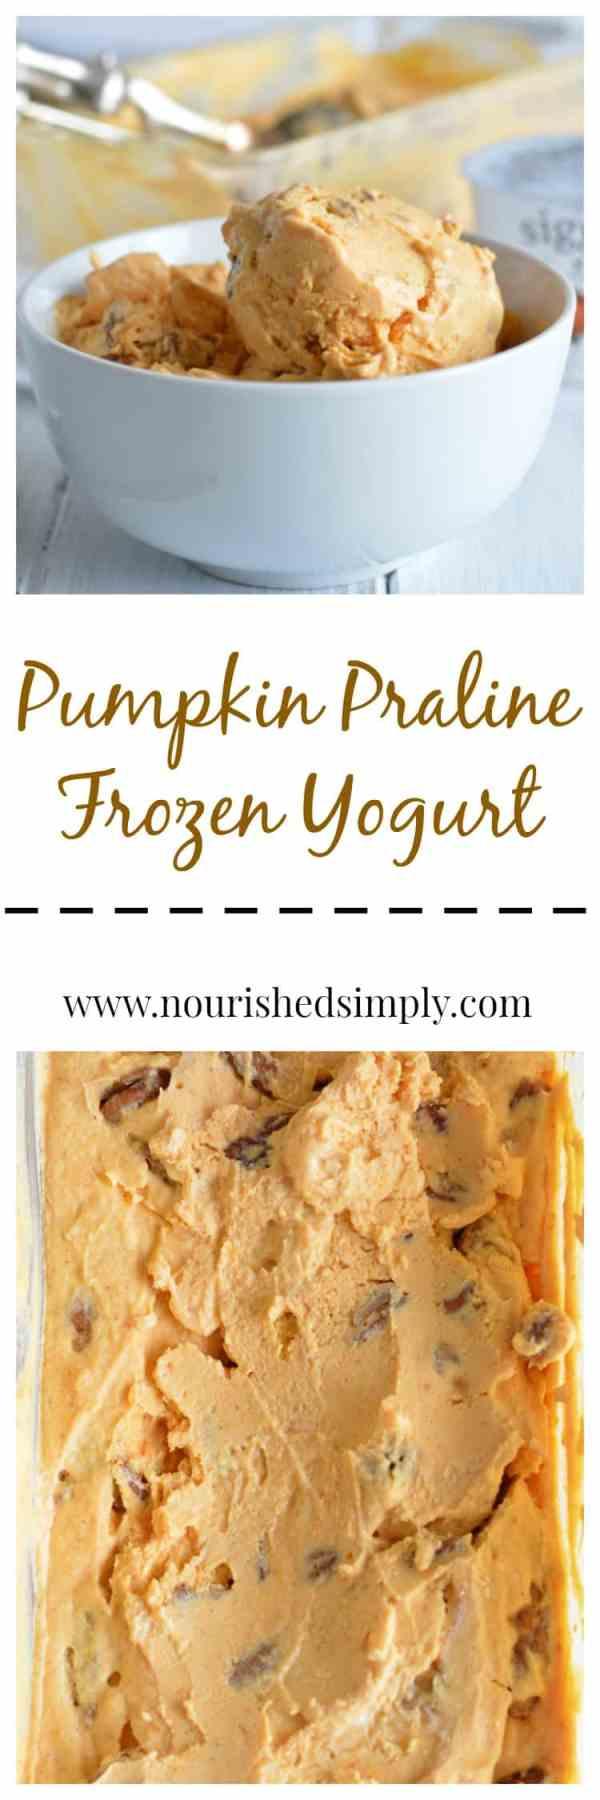 Pumpkin Praline Frozen Yogurt Nourished Simply